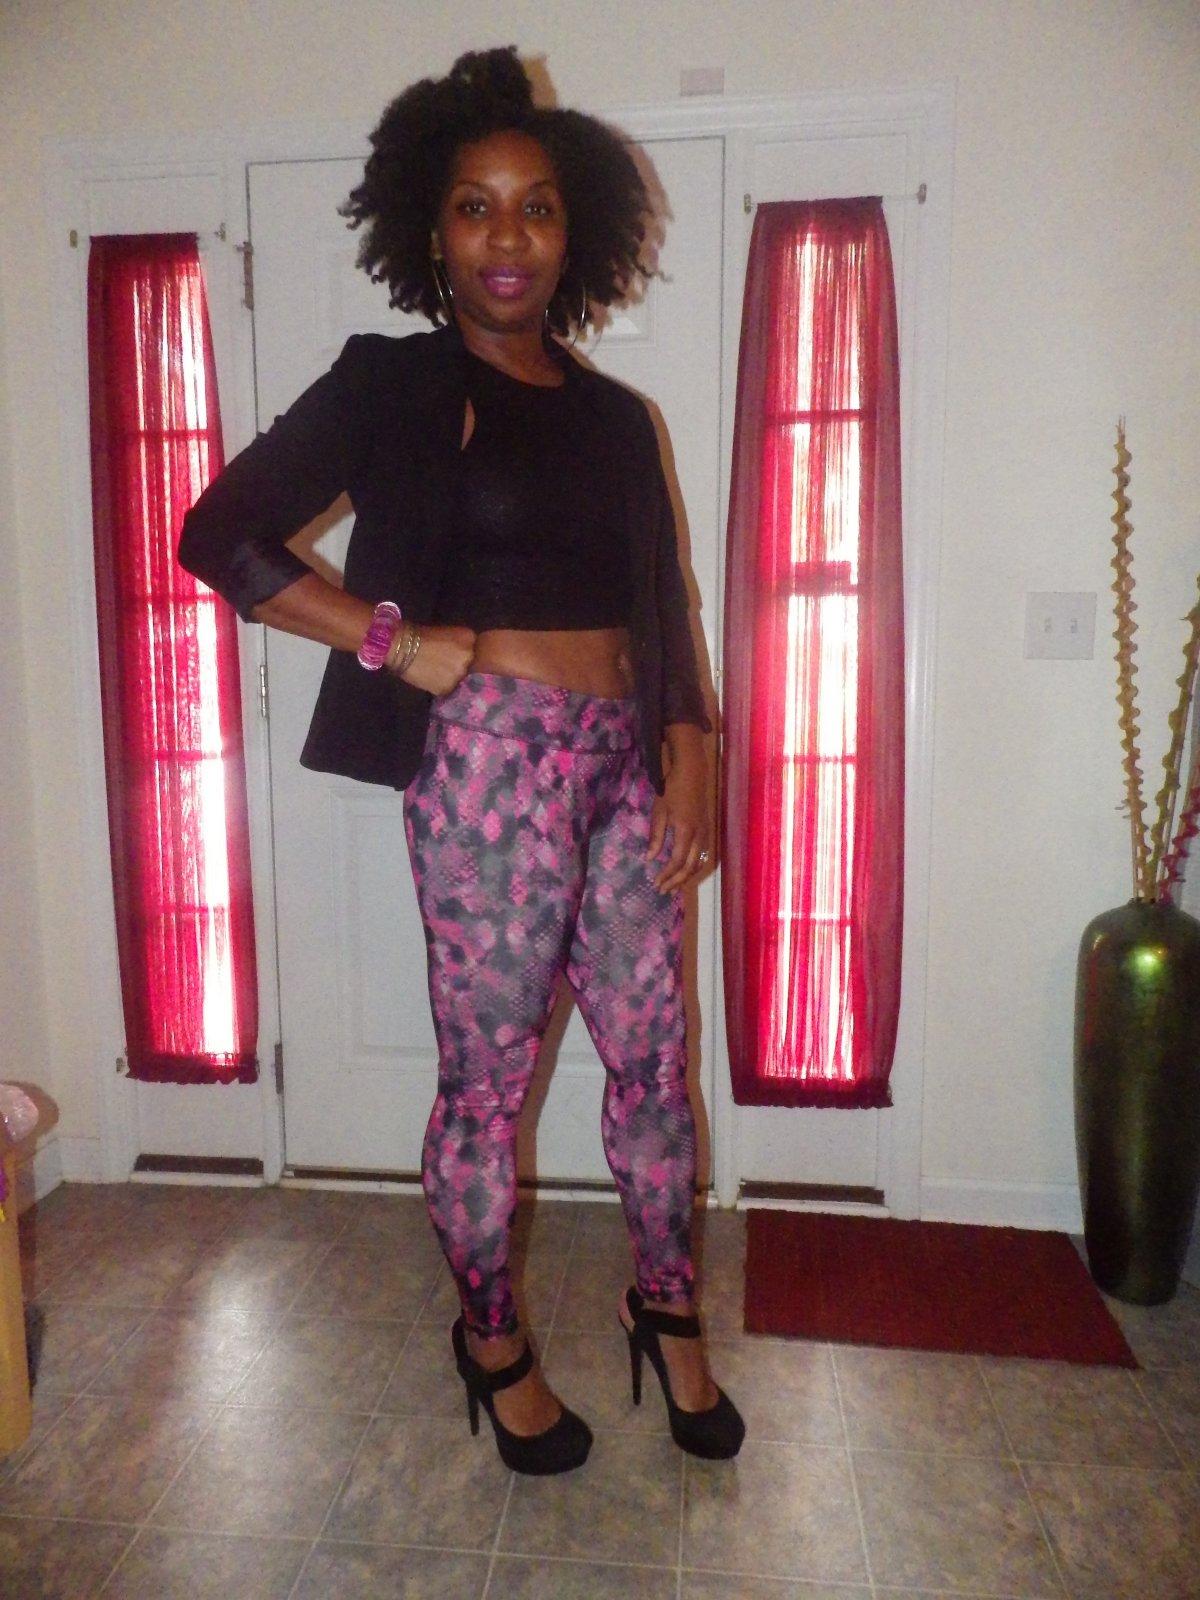 Print leggings for nightlife